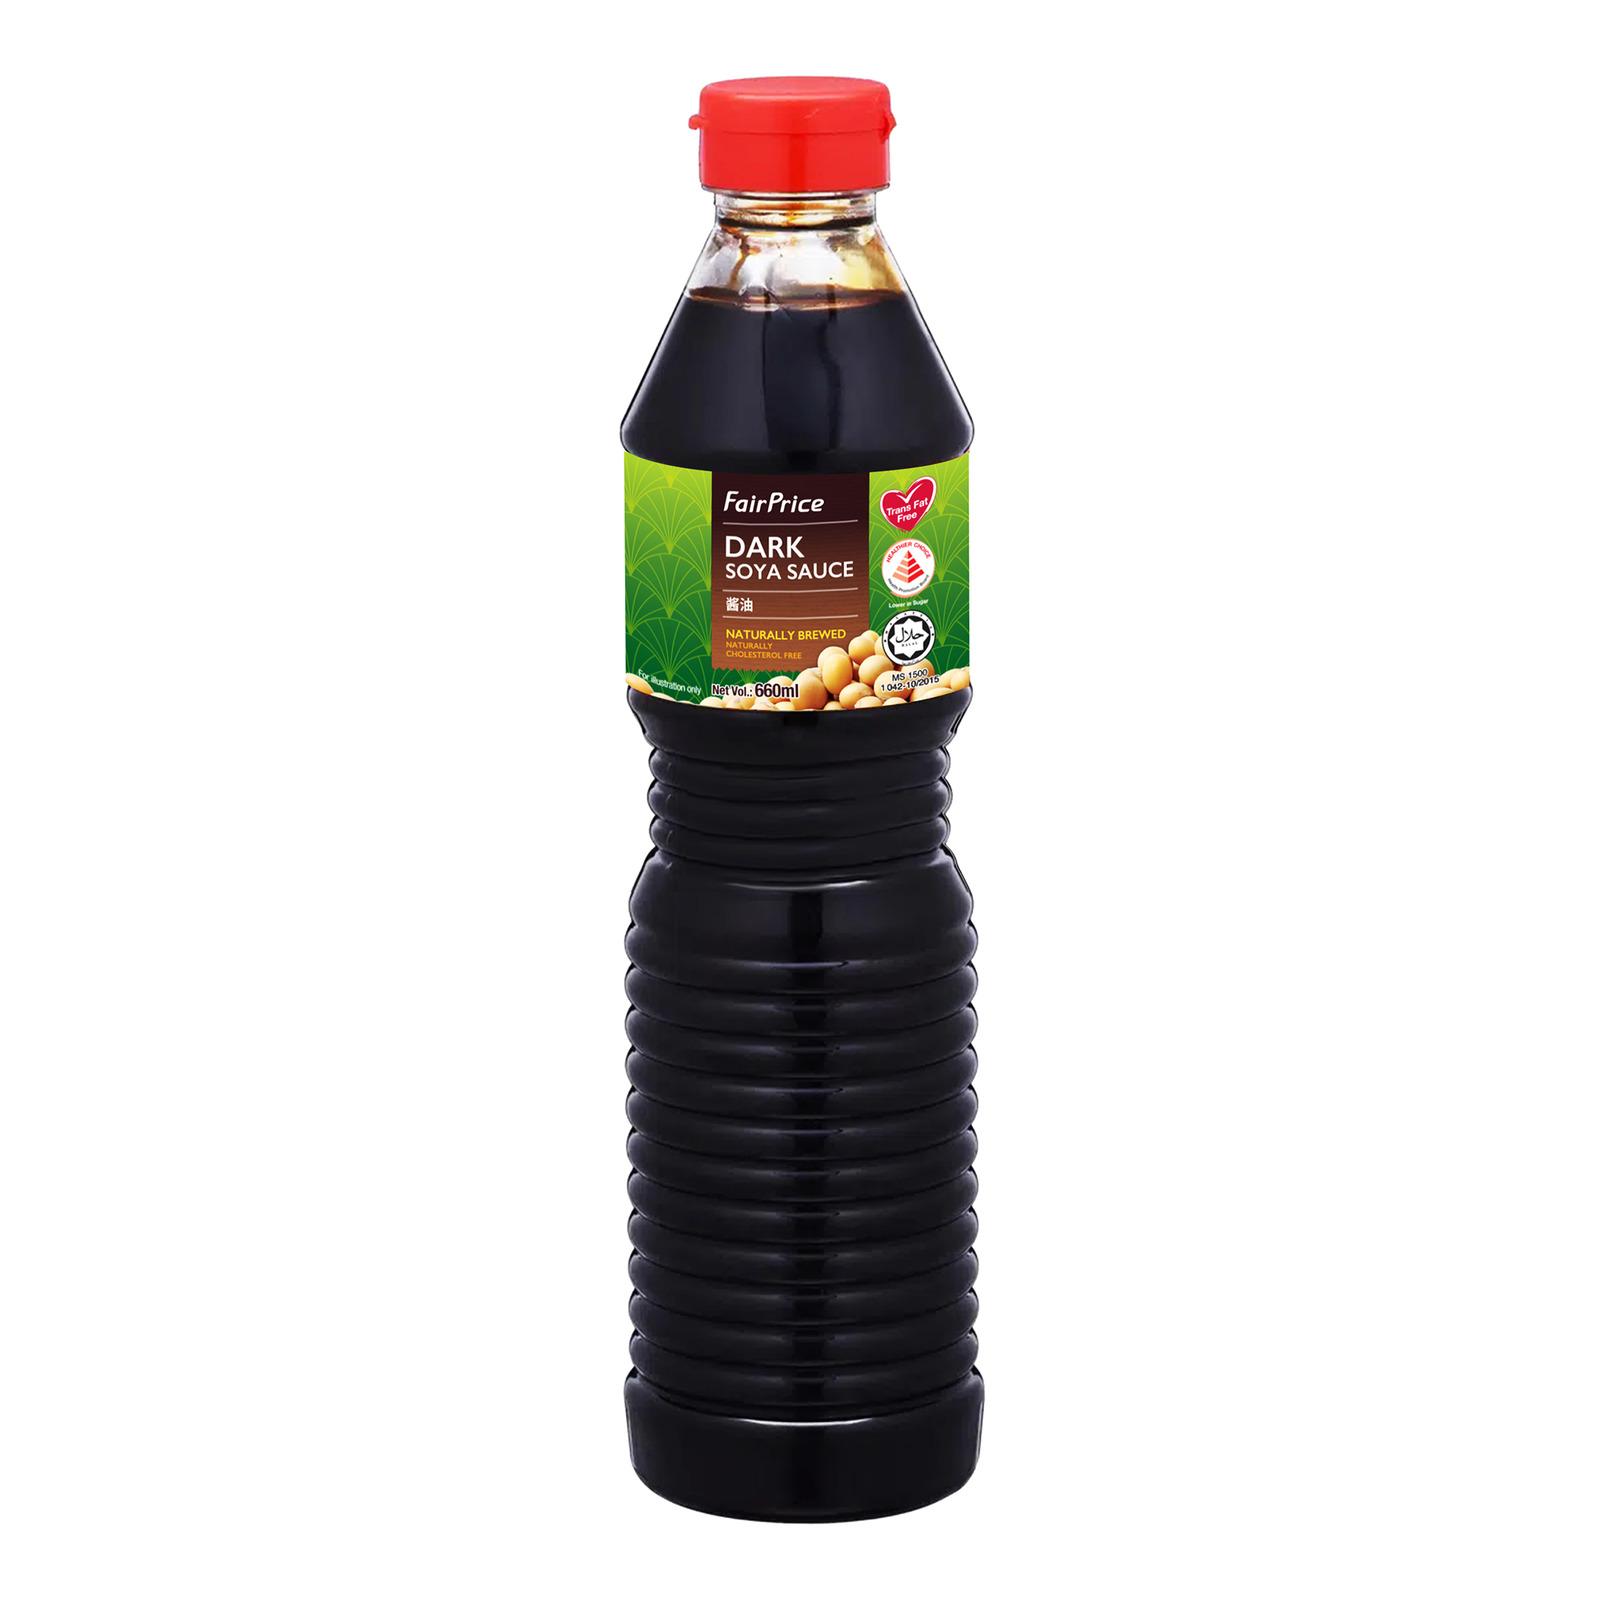 GIANT Dark Soya Sauce 640ml